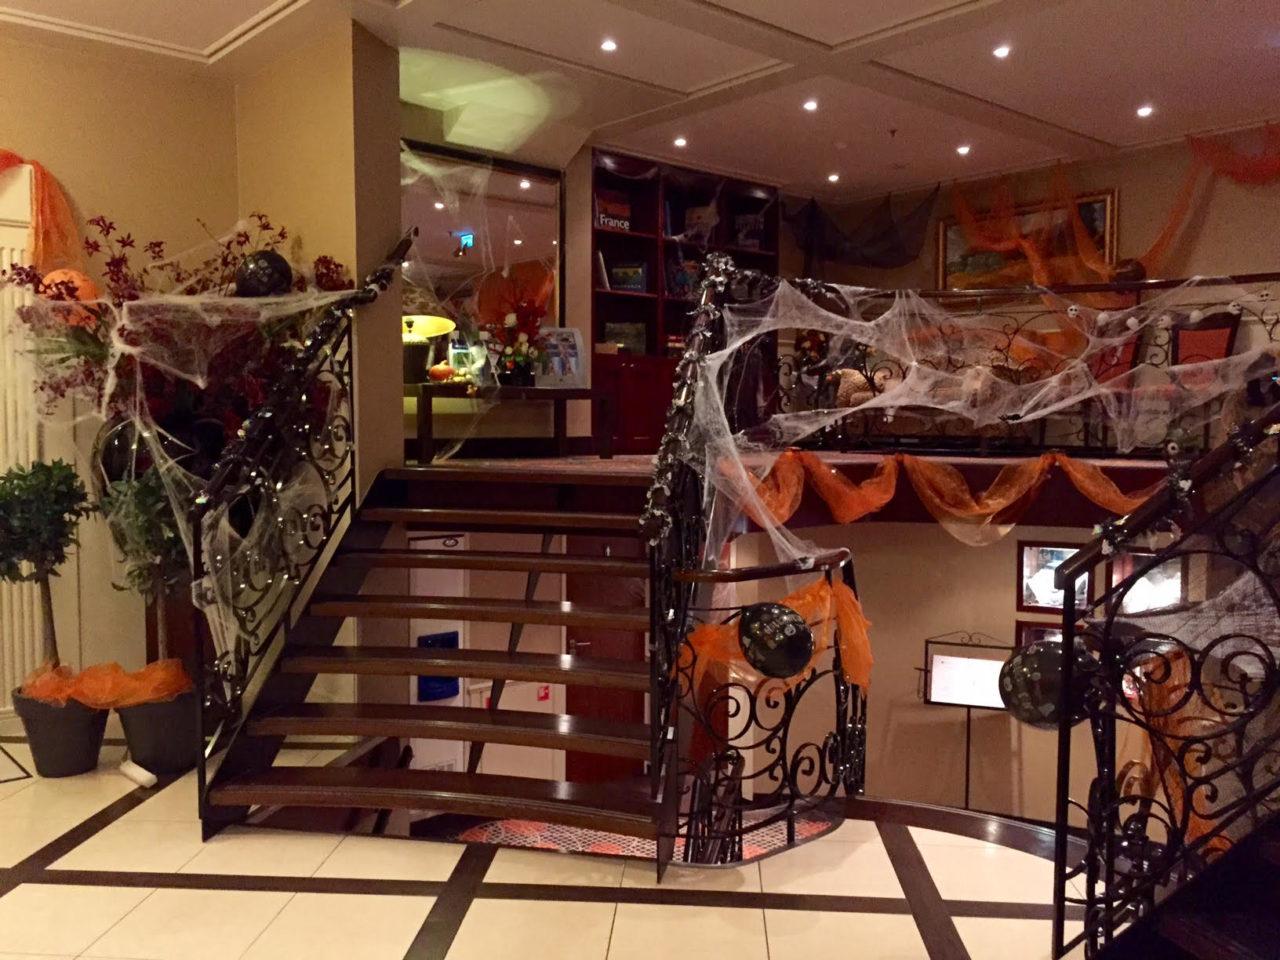 AMALegro river cruise ship dressed up for Halloween night (Paris and Normandie AMAWaterways Cruise)